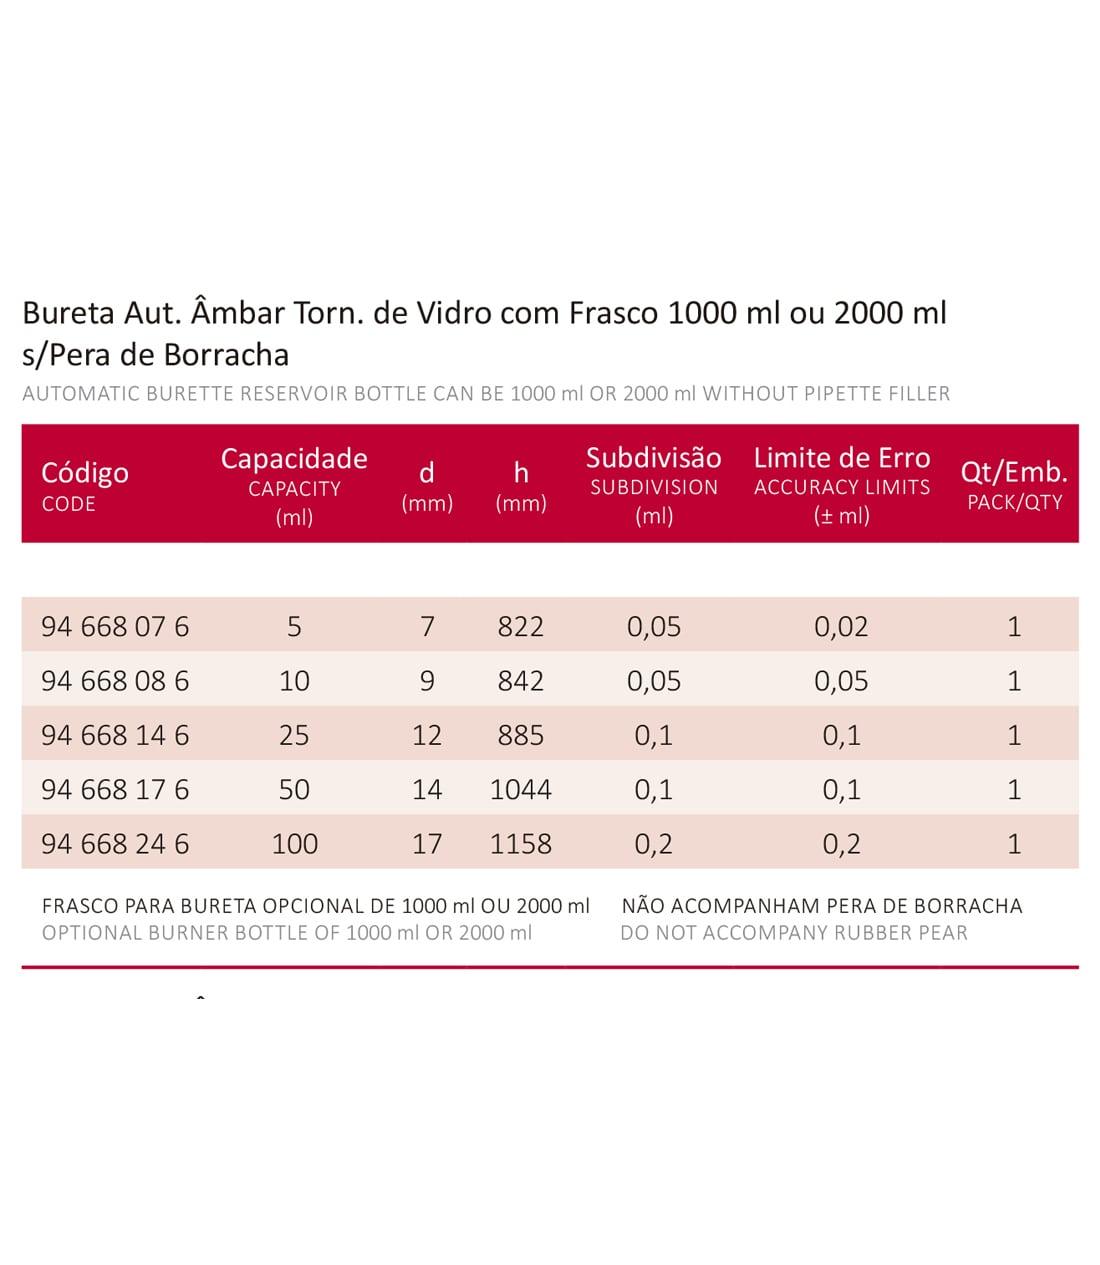 BURETA AUTOMÁTICA ÂMBAR TORN. DE VIDRO C/FRASCO 10 ML - Laborglas - Cód. 94668086